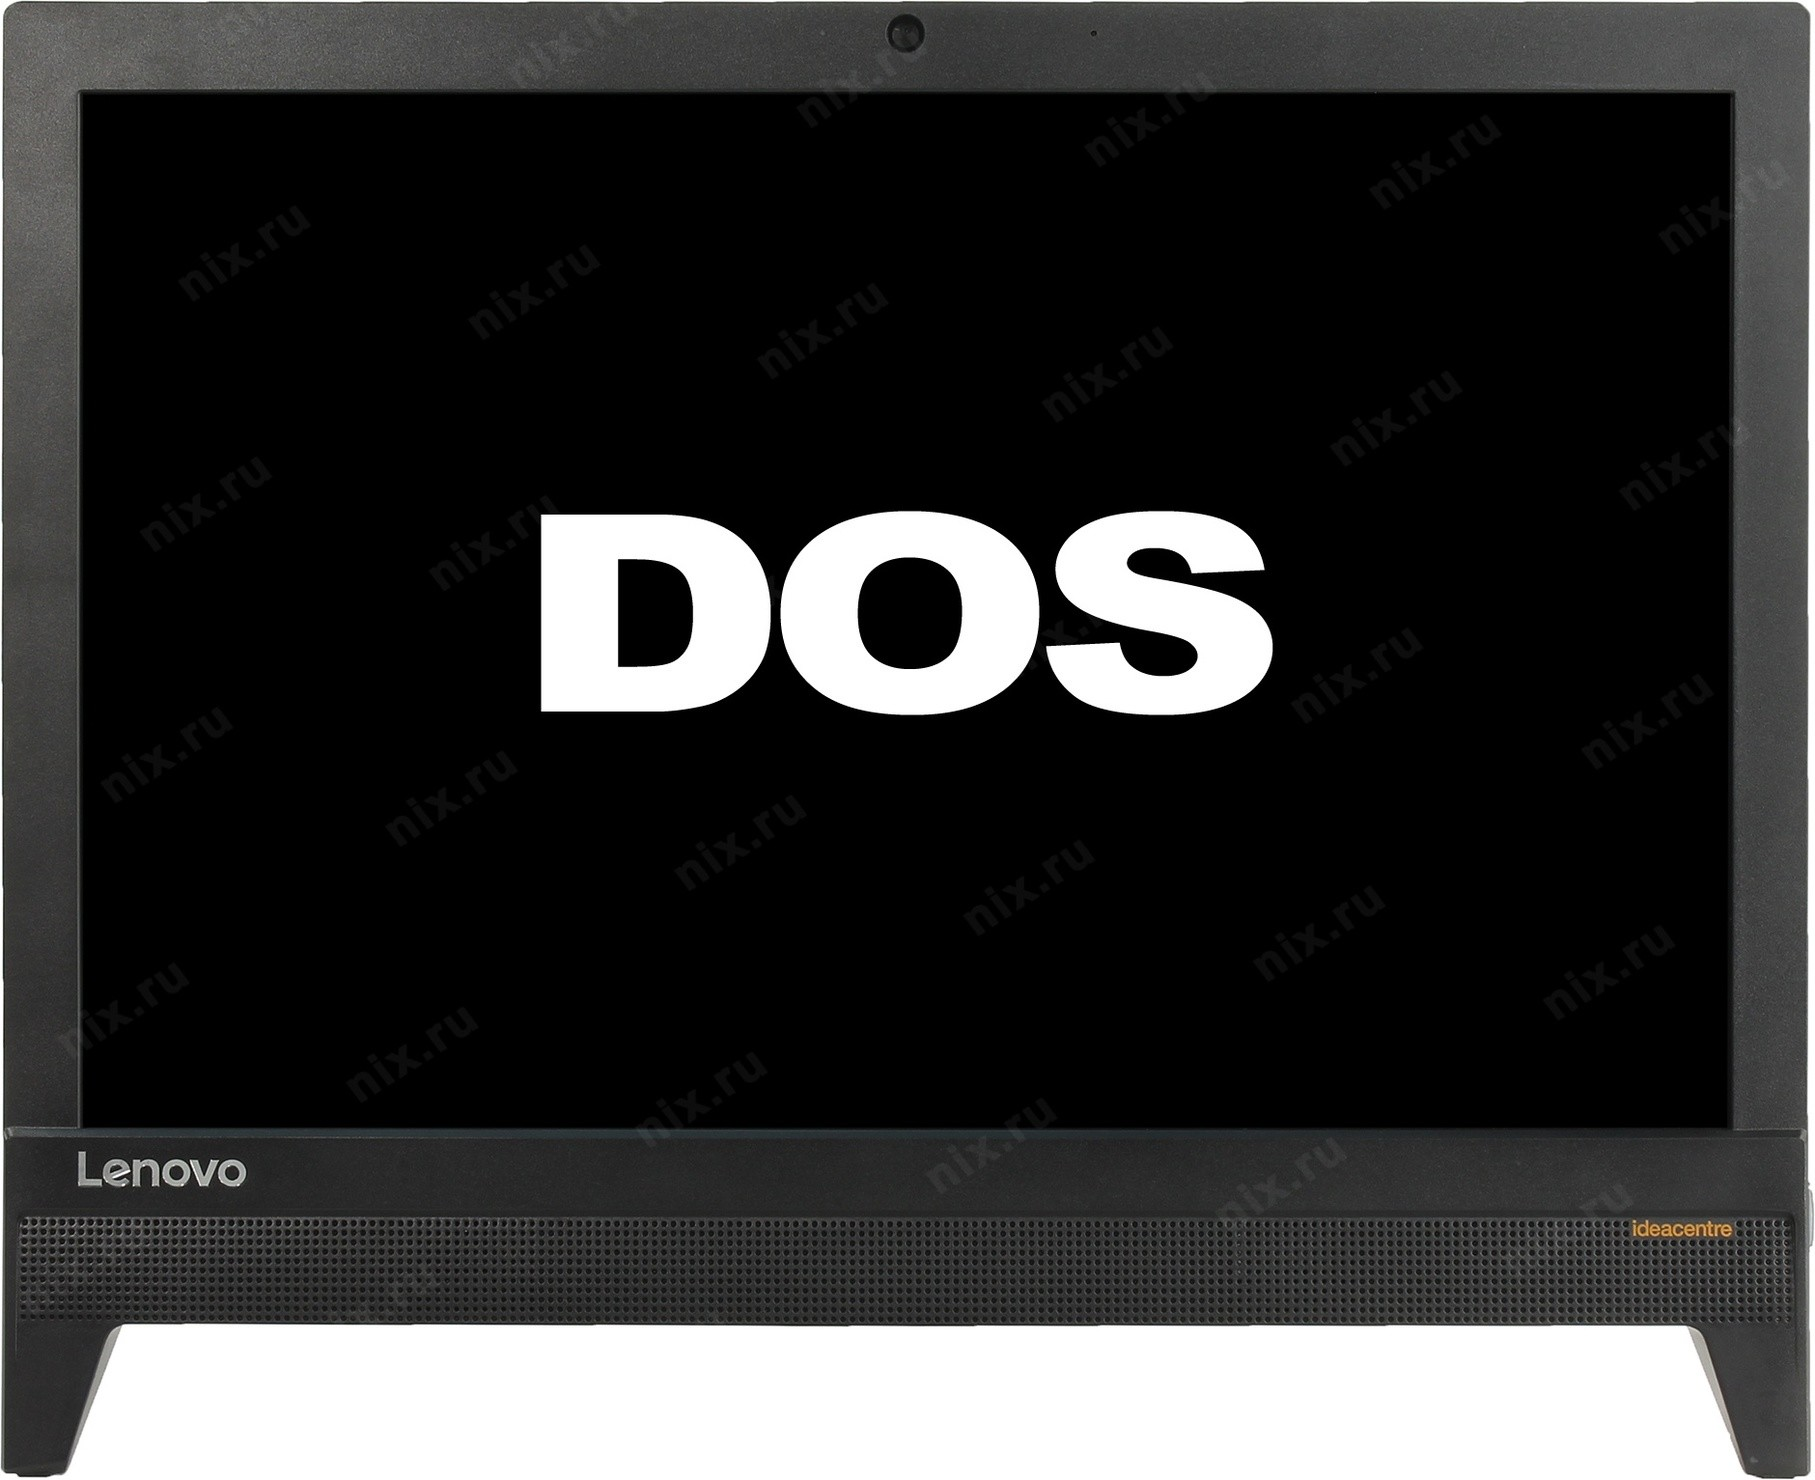 Lenovo Ideacentre Aio 310 20iap F0cl002hrk Celeron J3355 4gb Ddr3 500gb Hd White